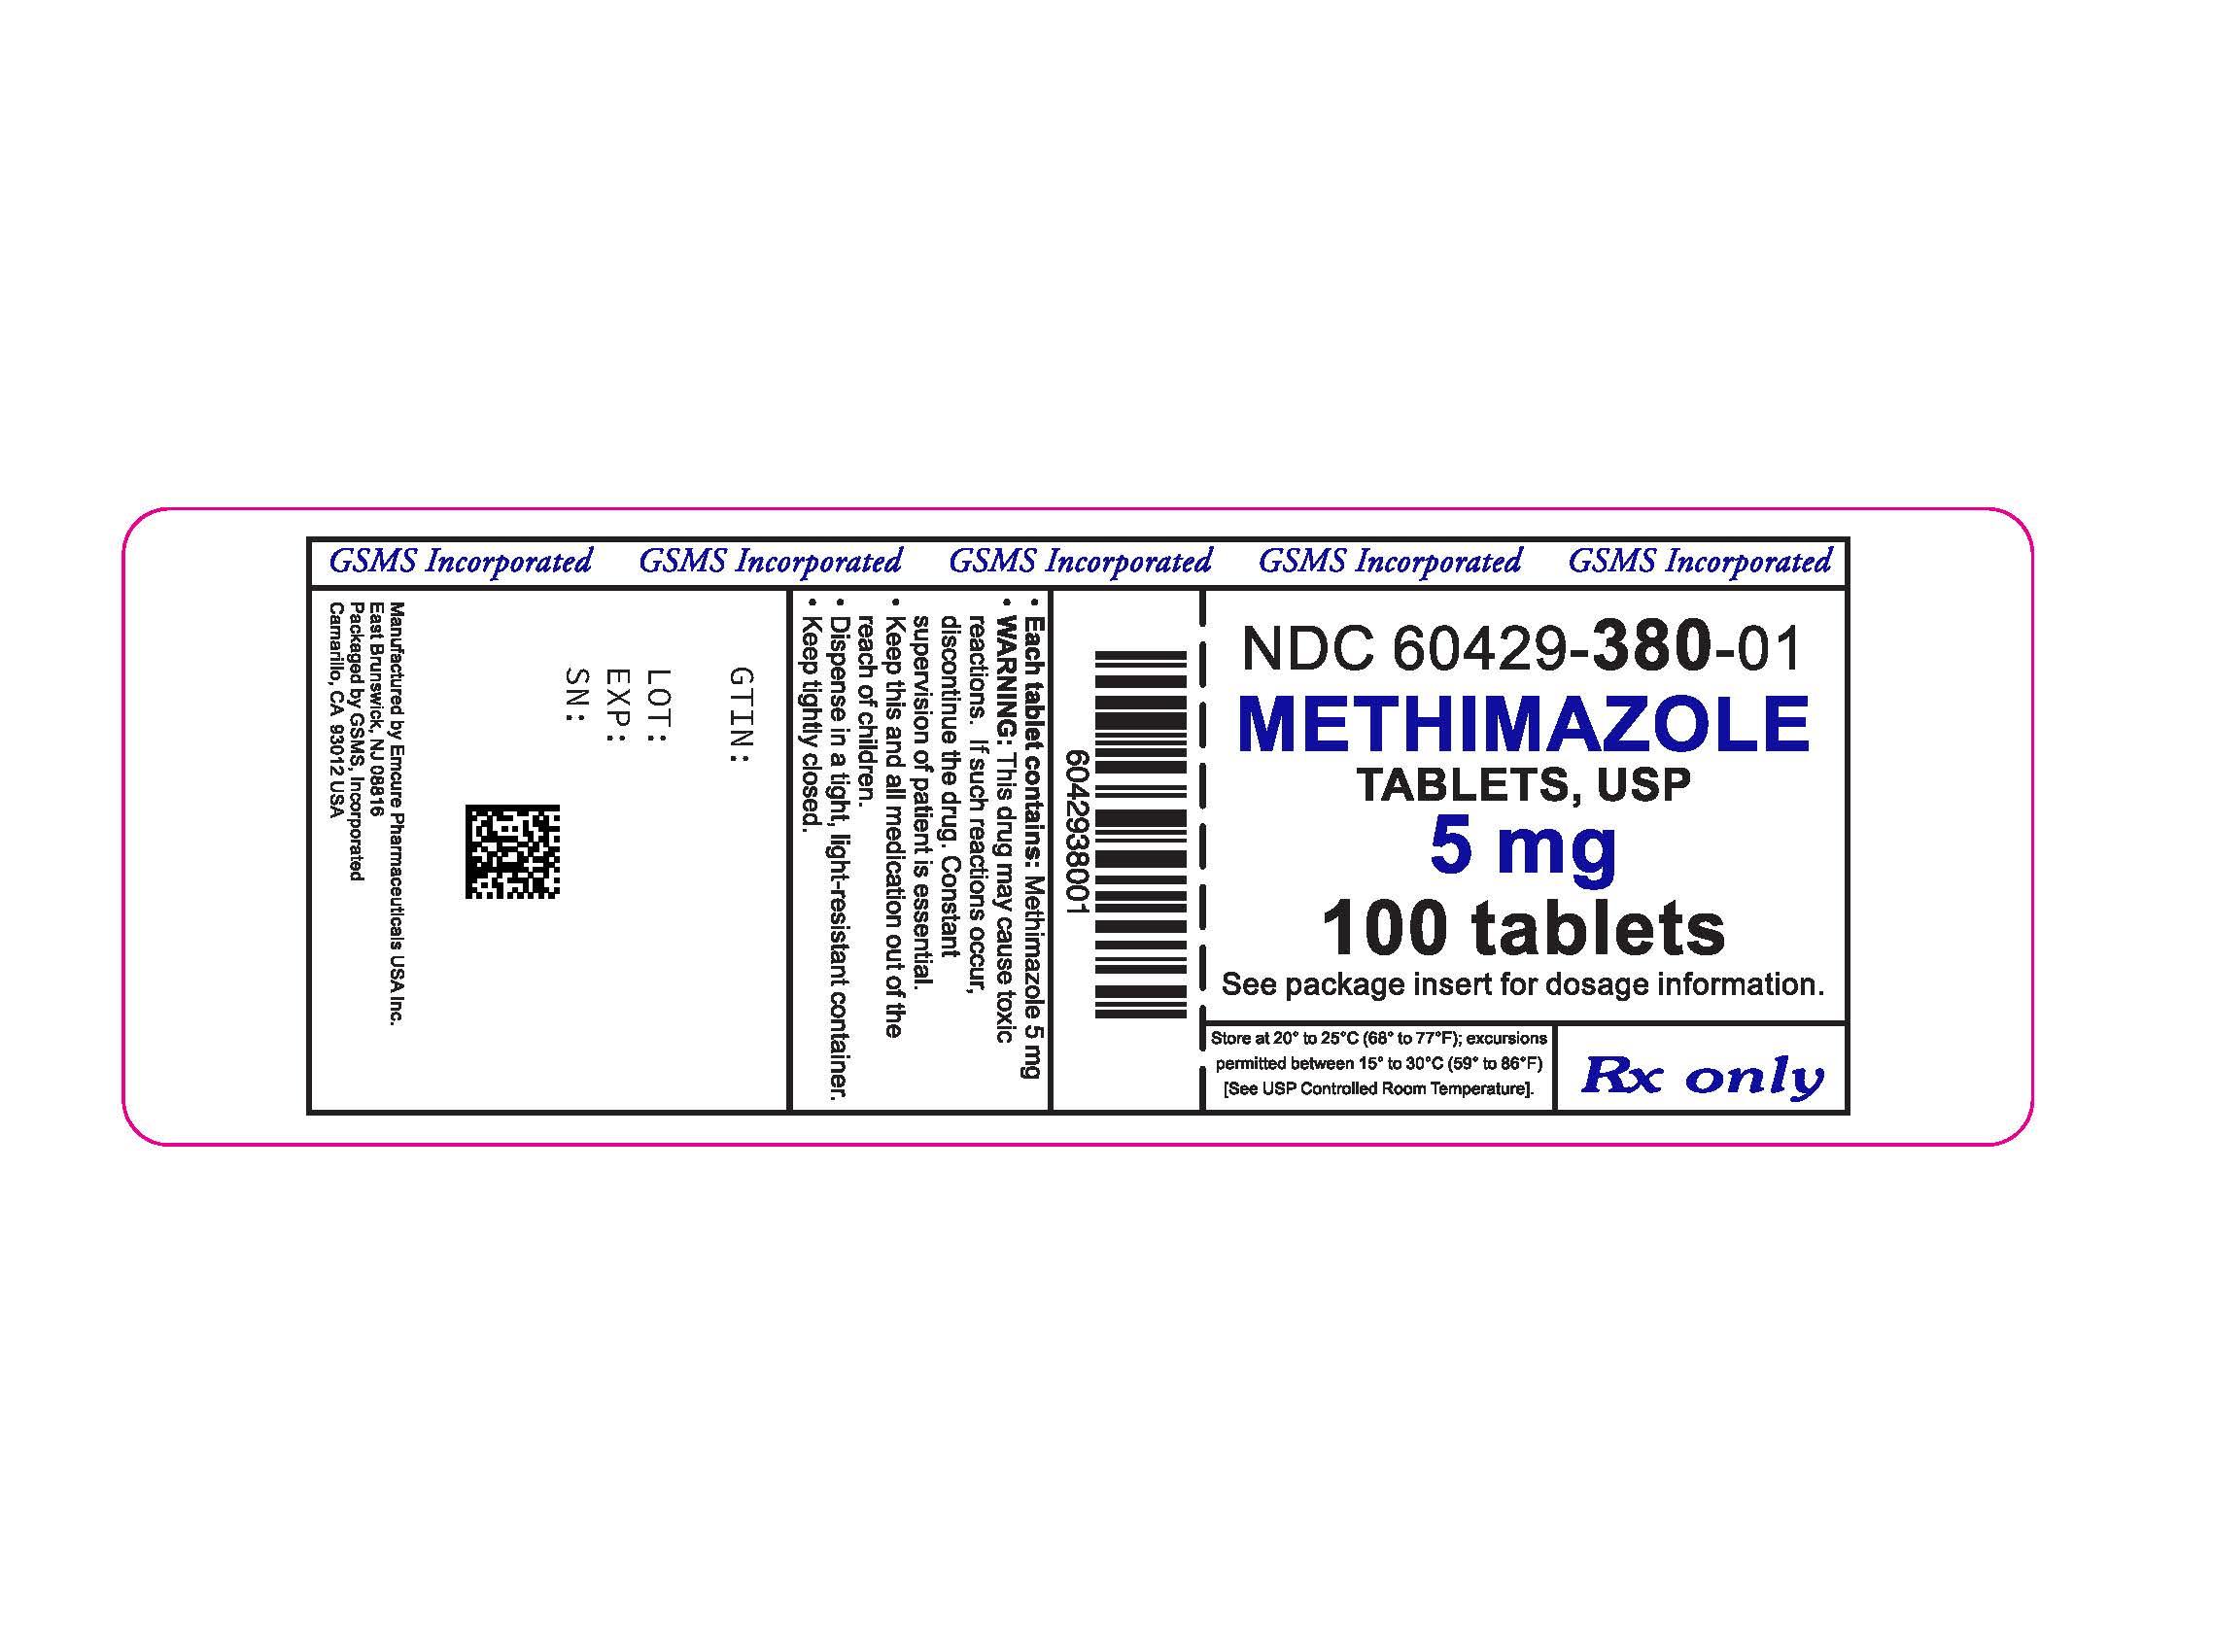 60429-380-01OL - METHIMAZOLE 5MG TABS - REV DEC 2015 - 10-30-2018.jpg